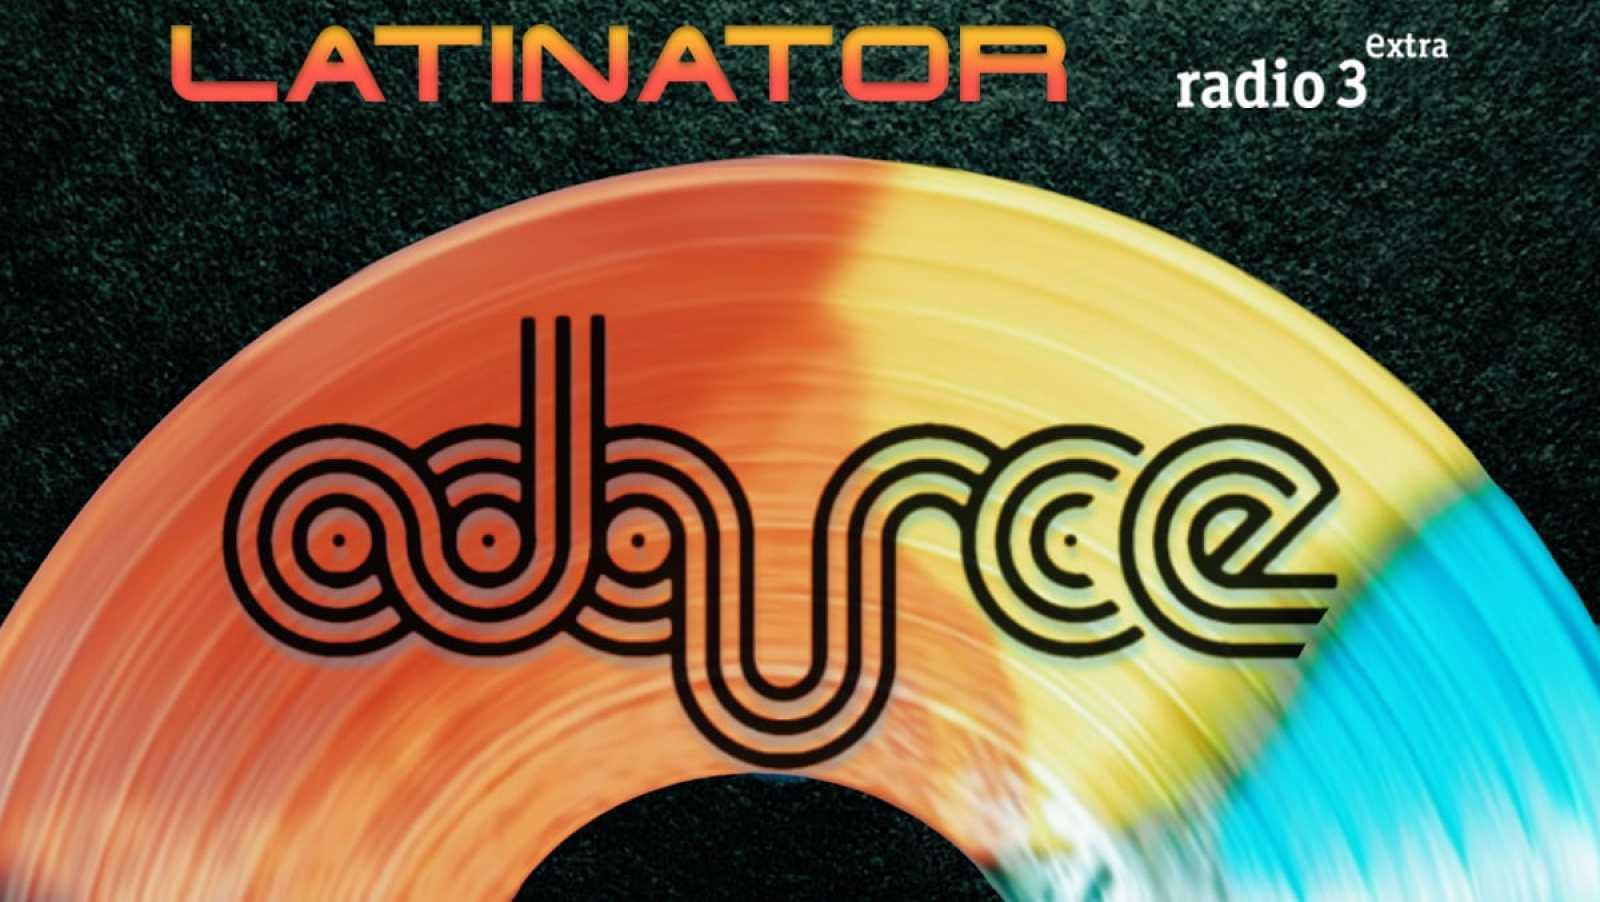 Latinator - ADARCE RECORDS - 28/05/20 - escuchar ahora